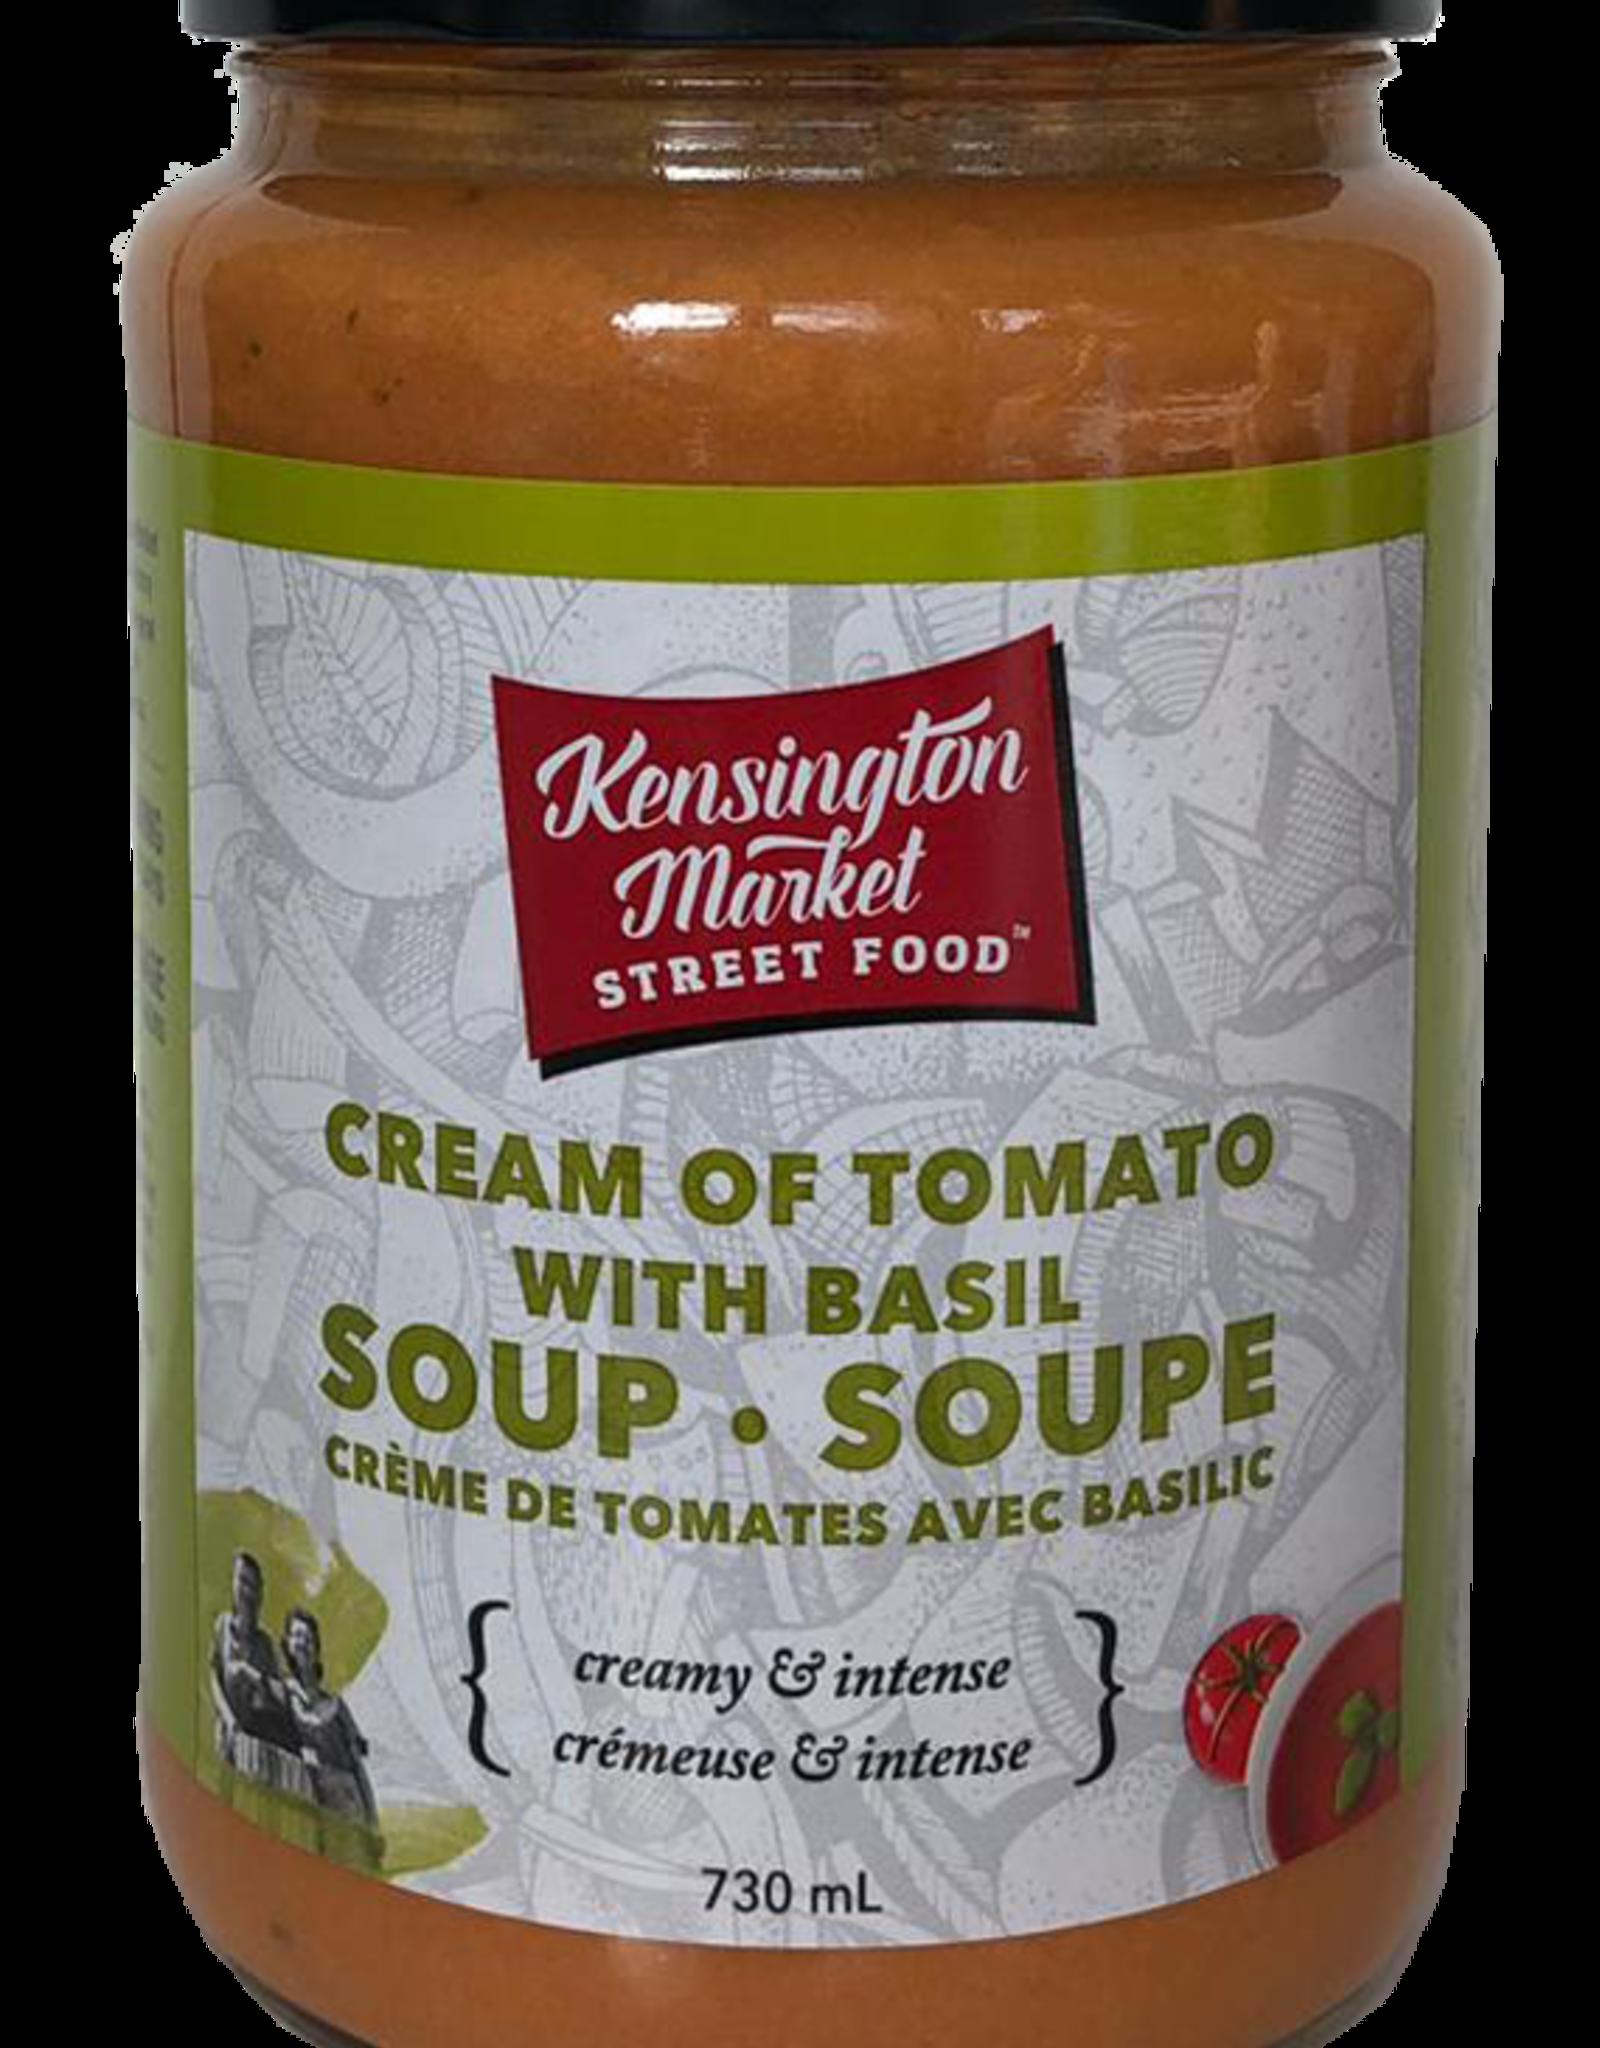 Kengsington Market Street Food Cream of Tomato with Basil Soup 730 ml